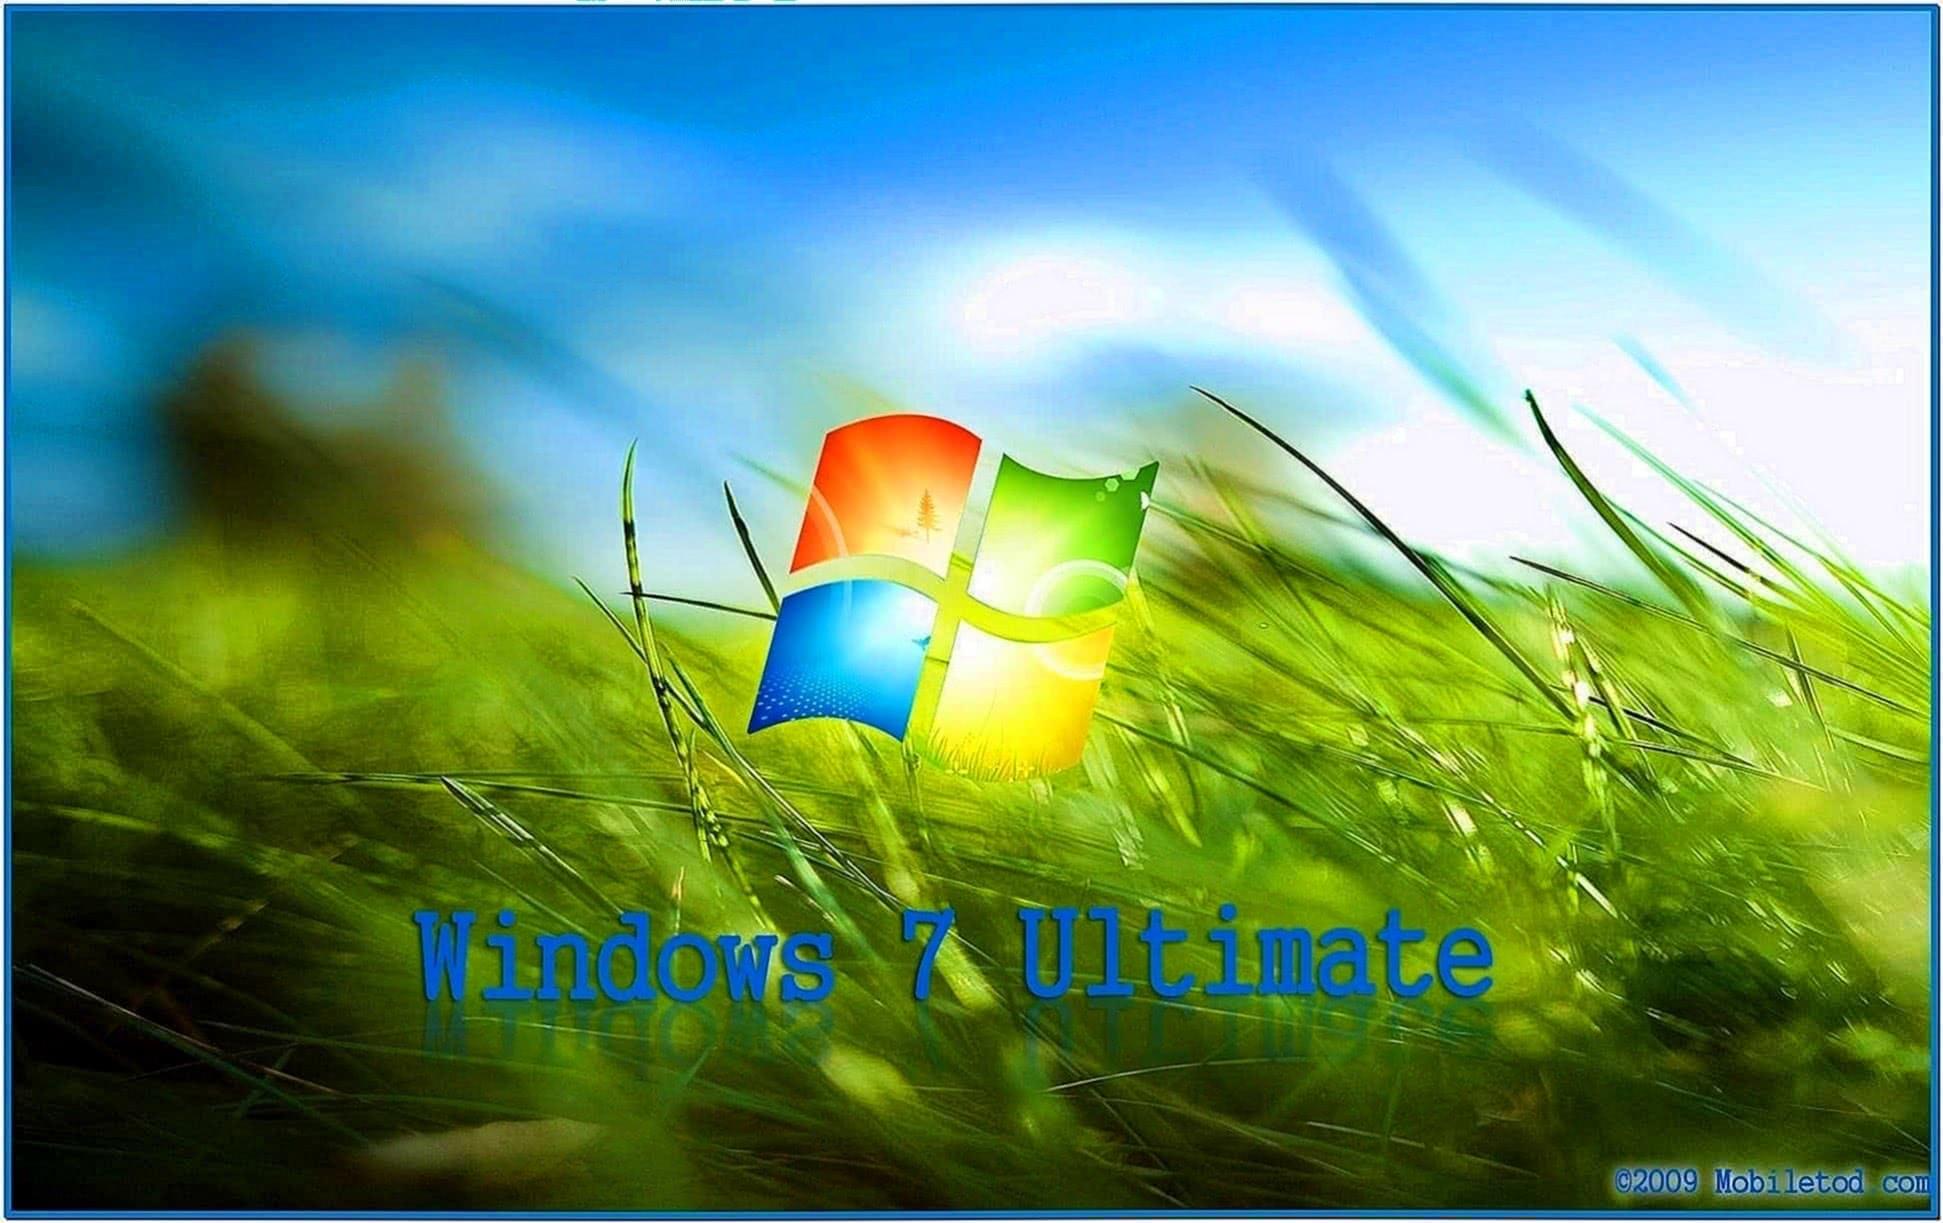 Screensaver Windows 7 ultimate